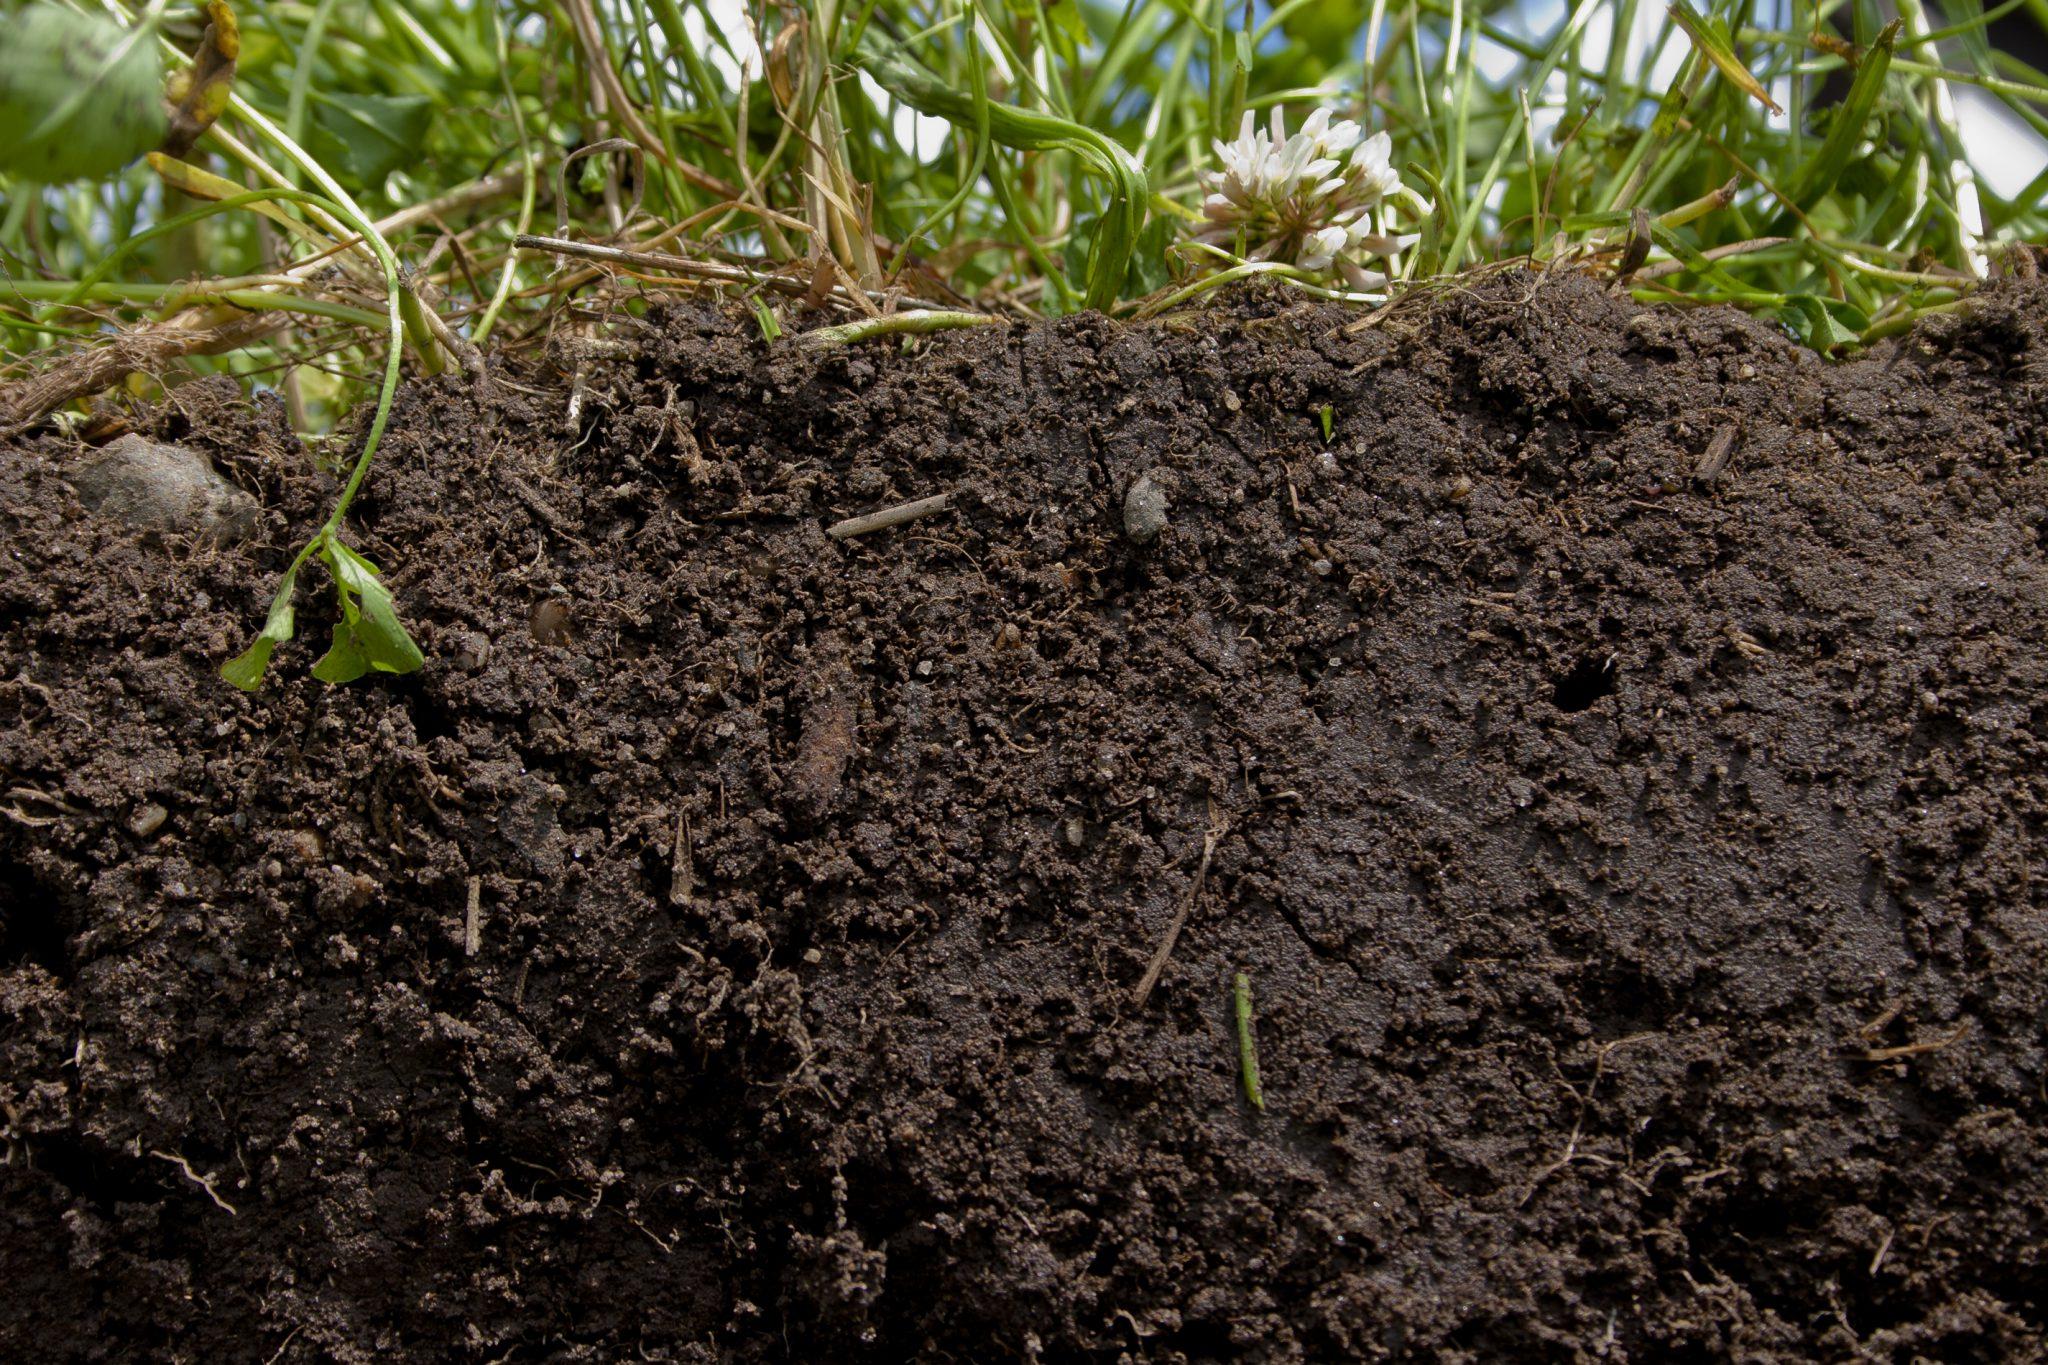 The soil beneath grass